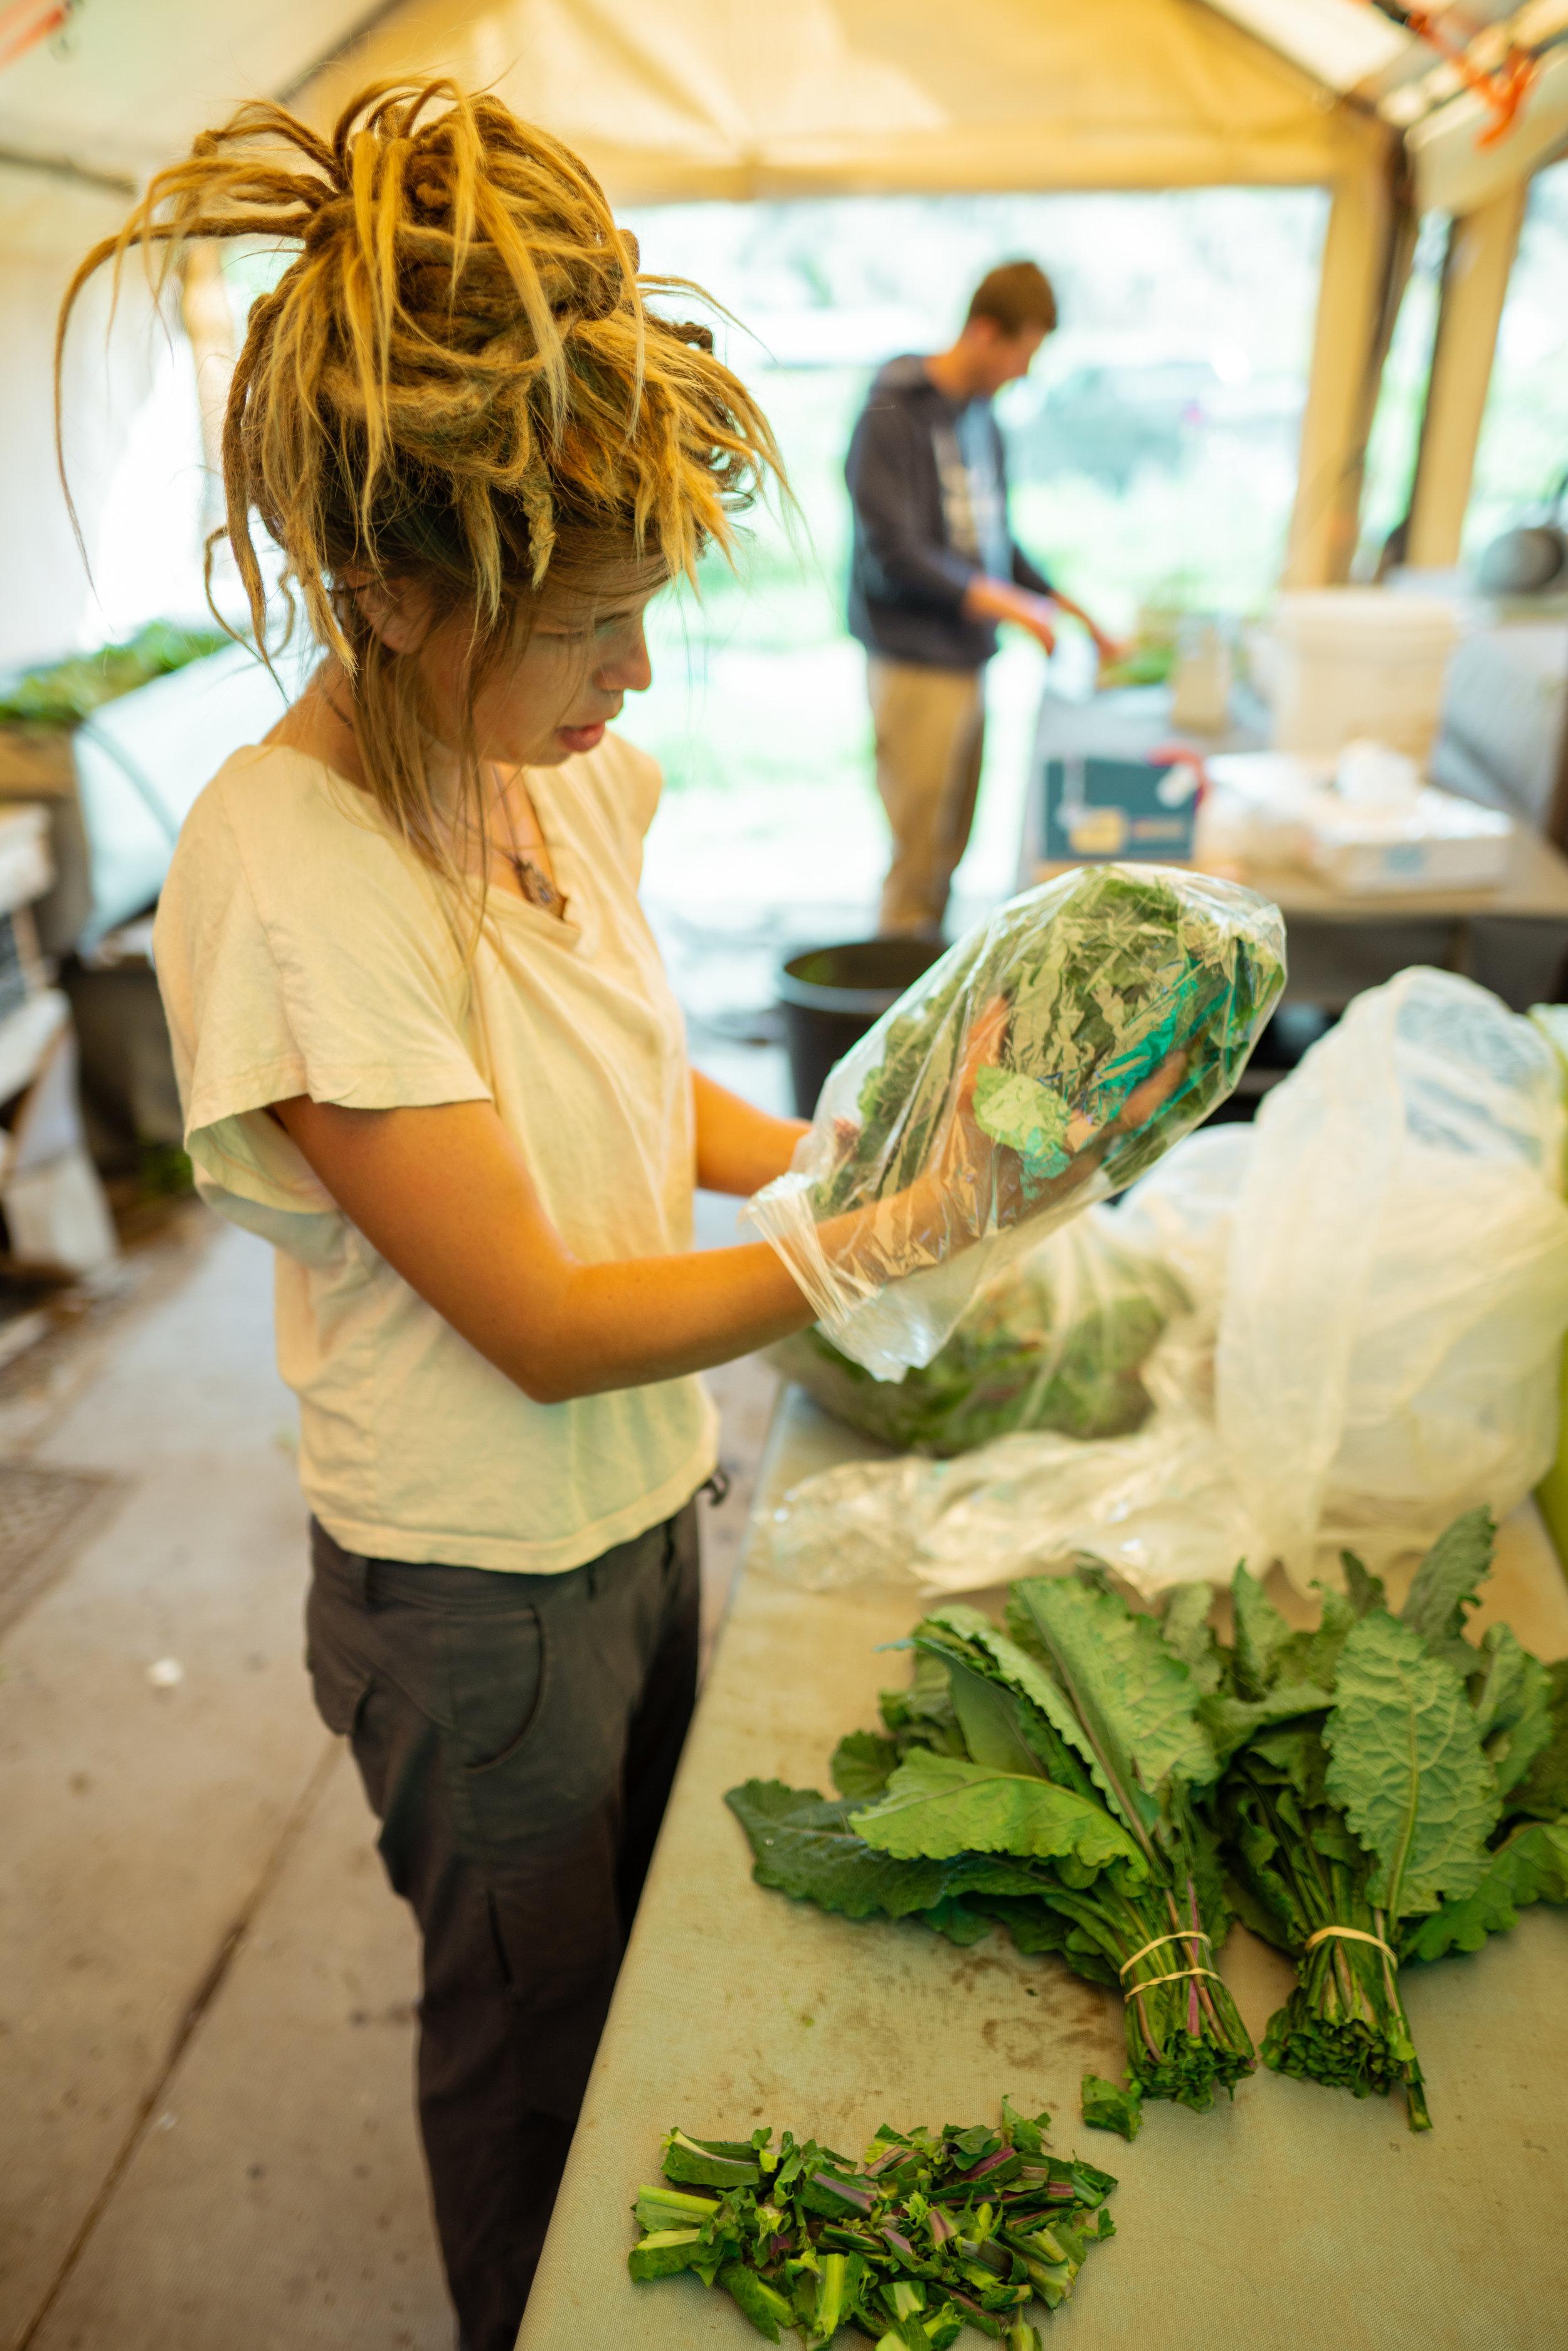 Kacy Senger packaging greens at Sprig & Root Farm in Clarkston, Montana.